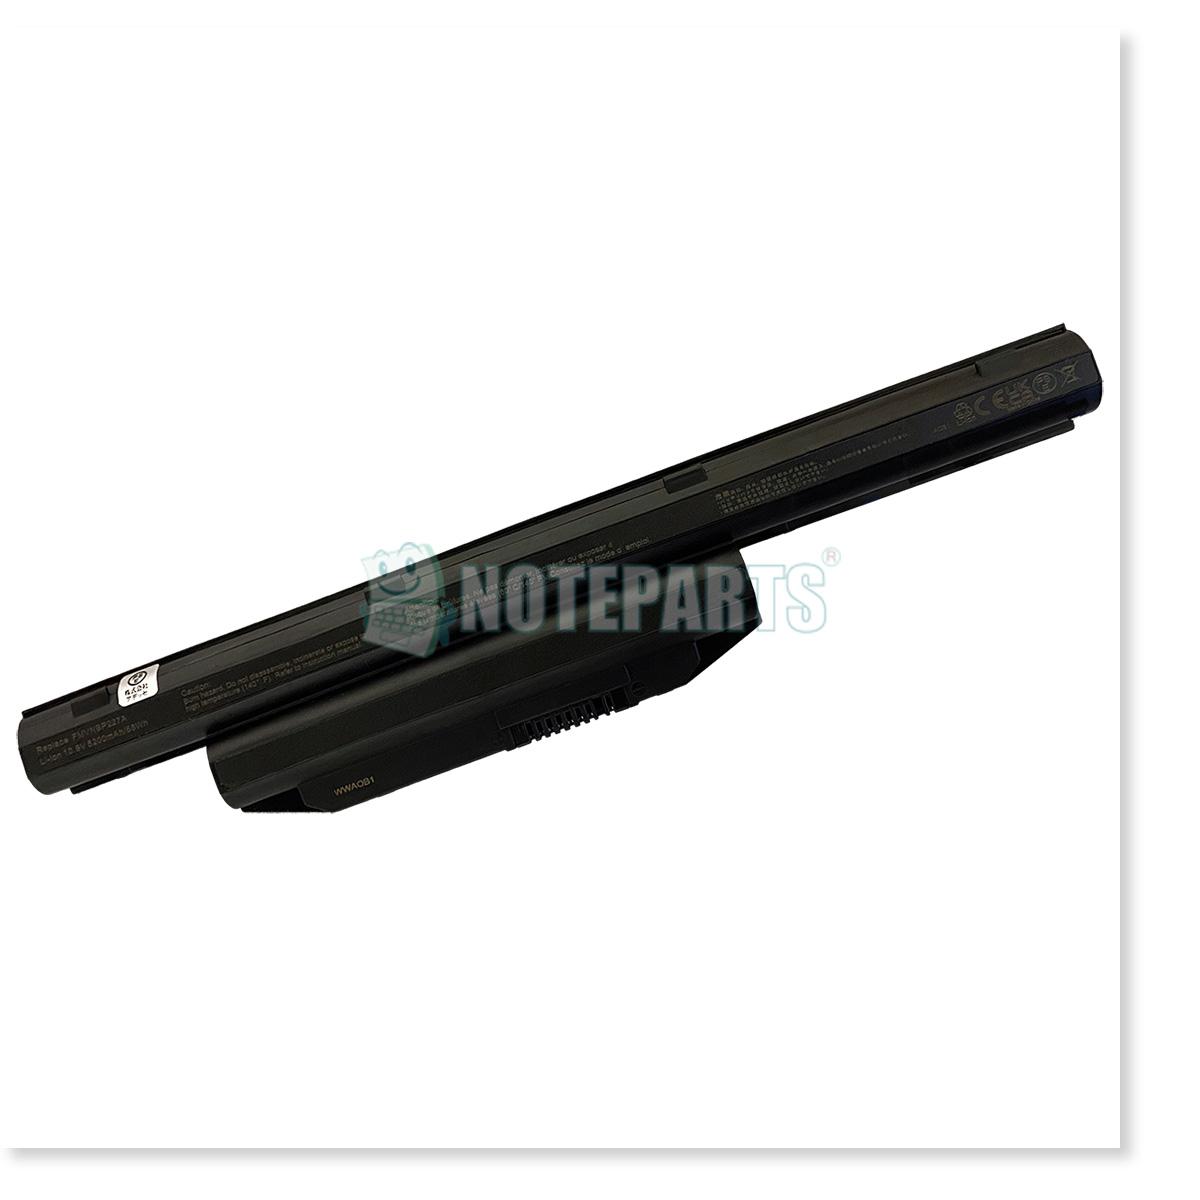 Fujitsu 富士通 LIFEBOOK バッテリー FMVNBP227 FMVNBP228 FMVNBP229 FMVNBP231 FMVNBP234 FMVNBP235対応